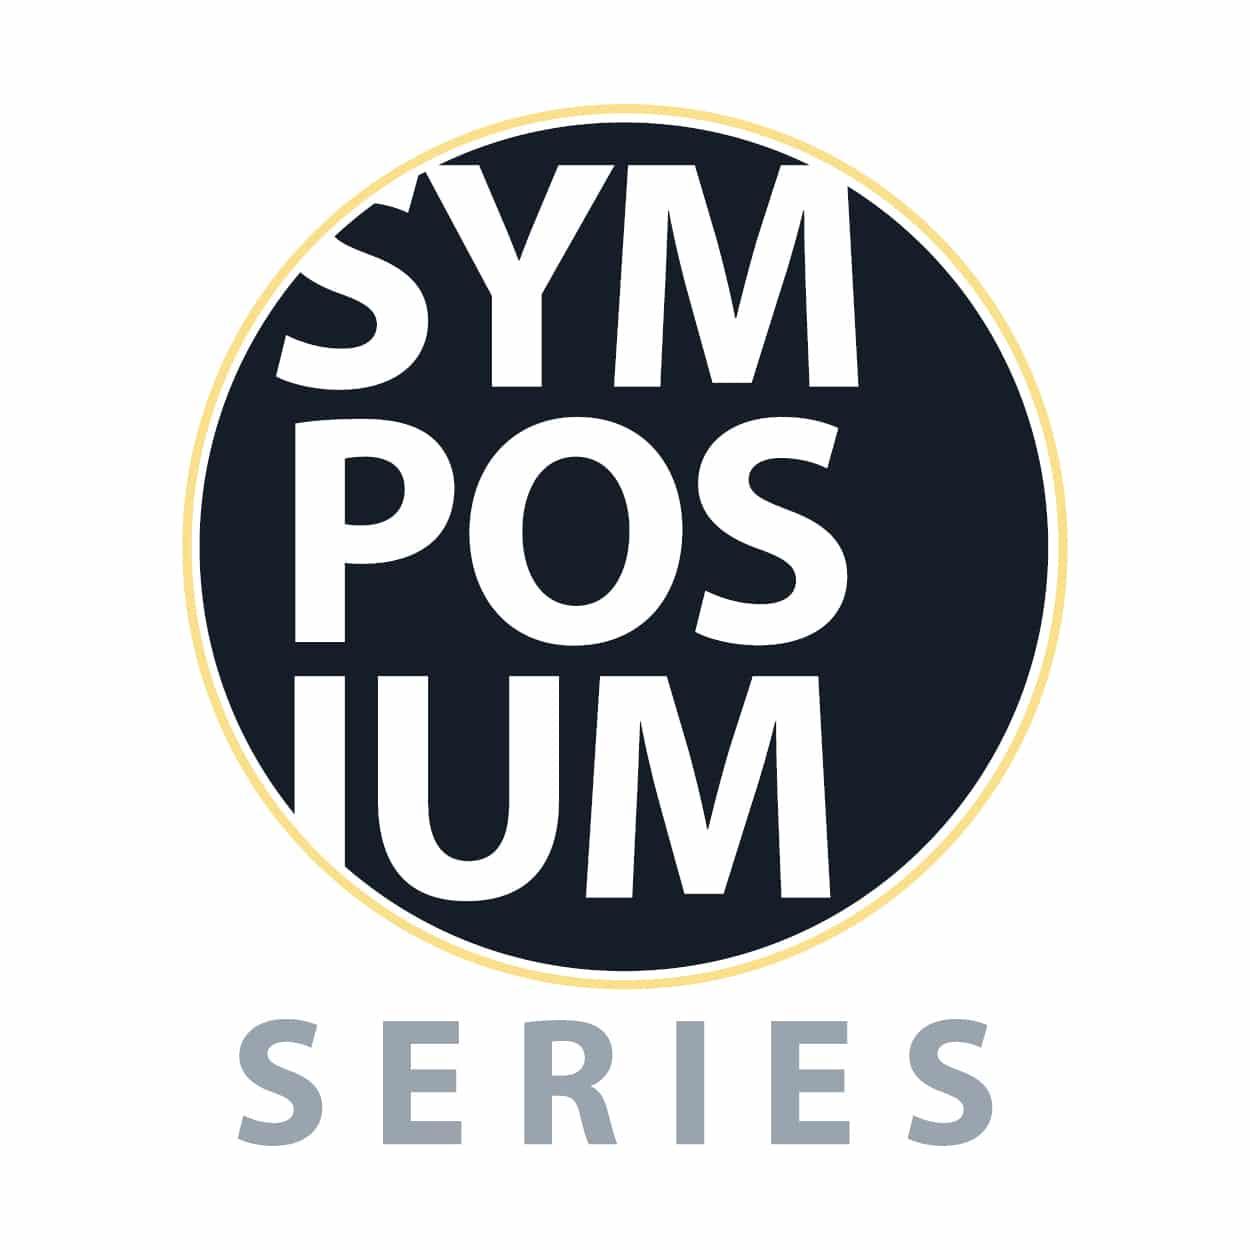 Symposium Series logo